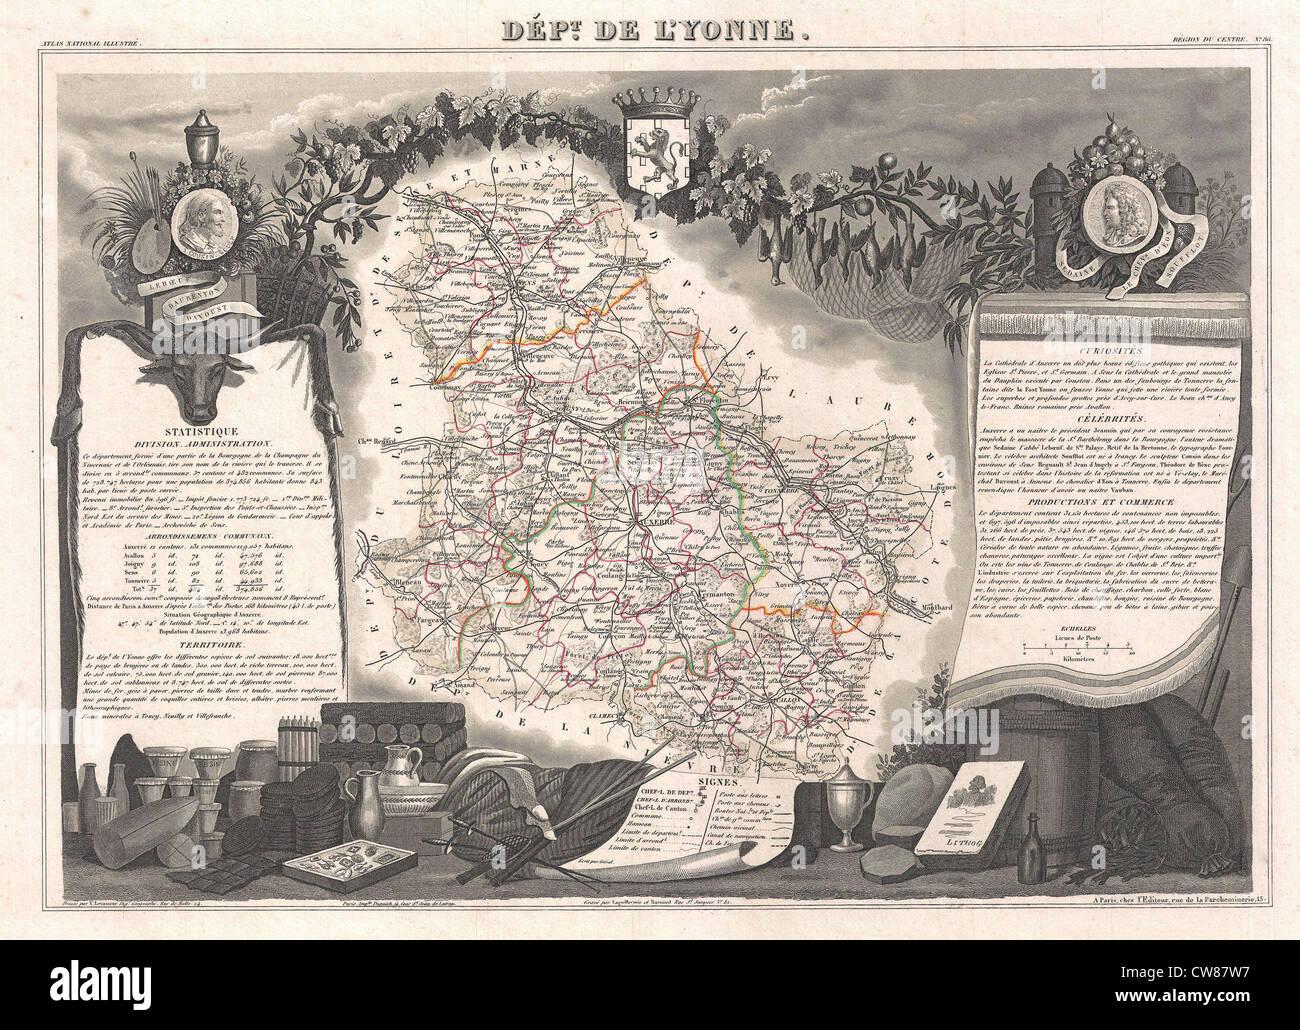 1852 Levasseur Map of the Department De L'Yonne (Burgundy or Bourgogne Wine Region) - Stock Image